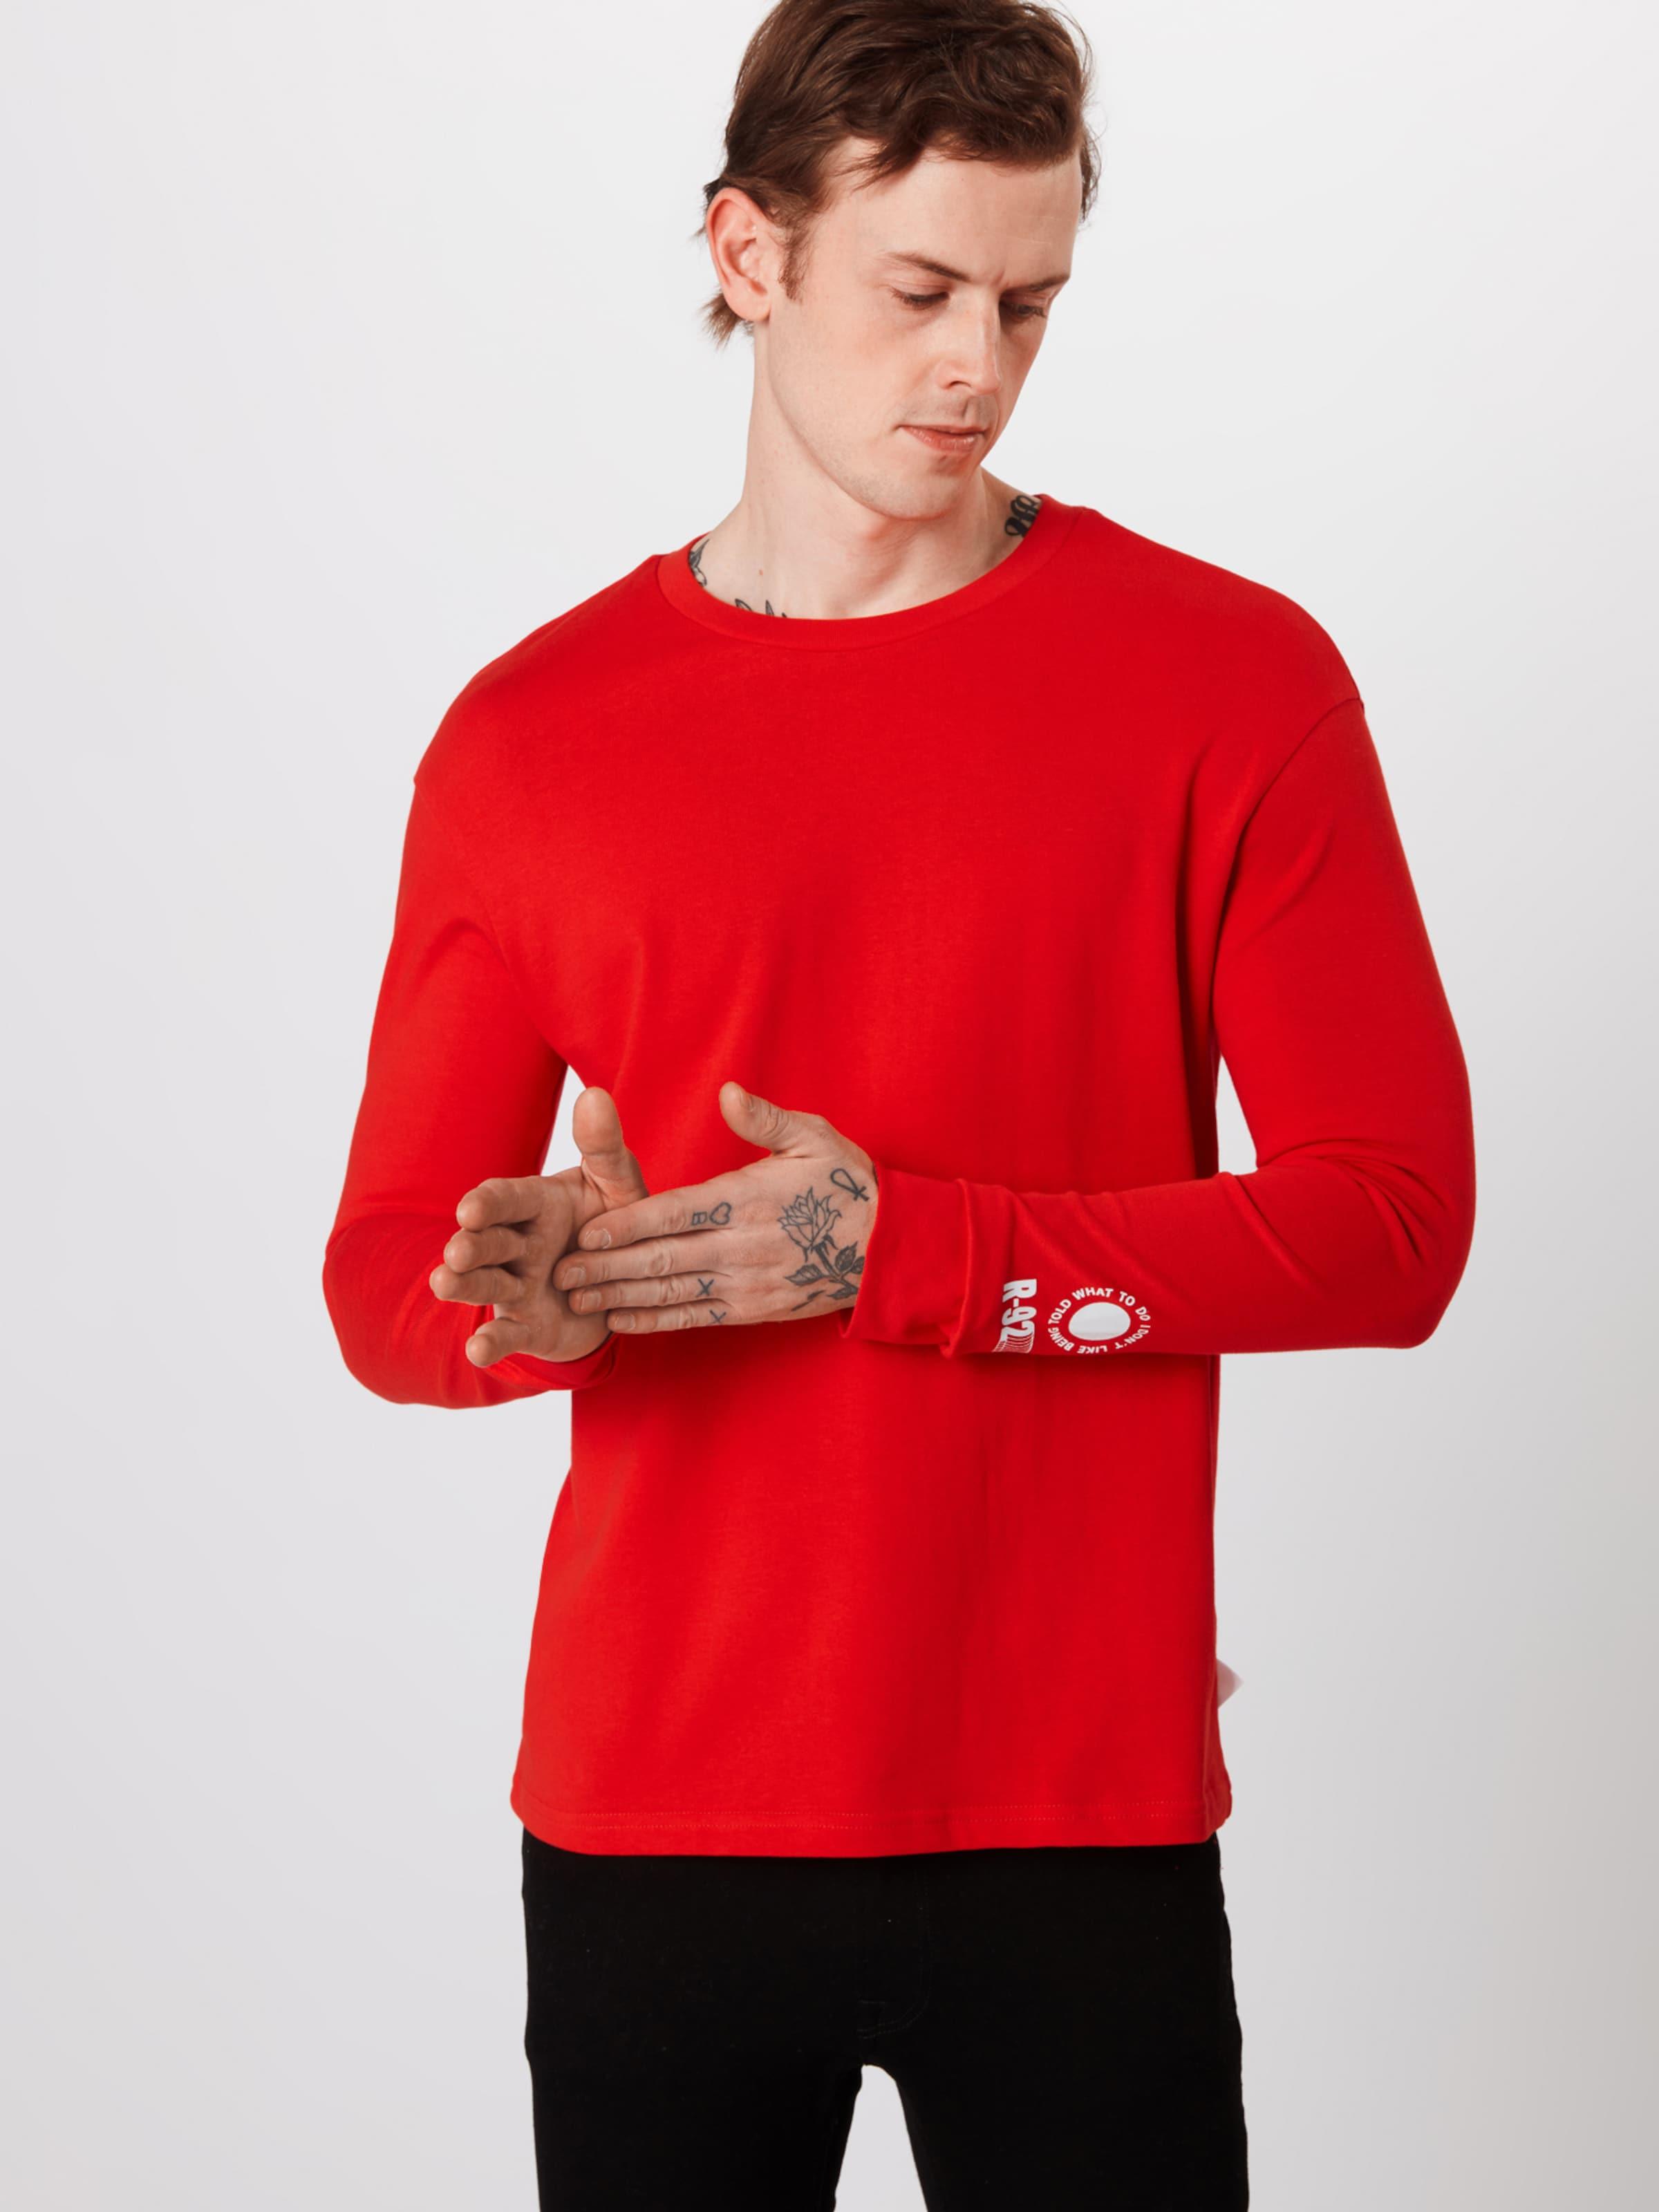 T 'ls shirt RougeBlanc En Review Print' wXO8P0nk